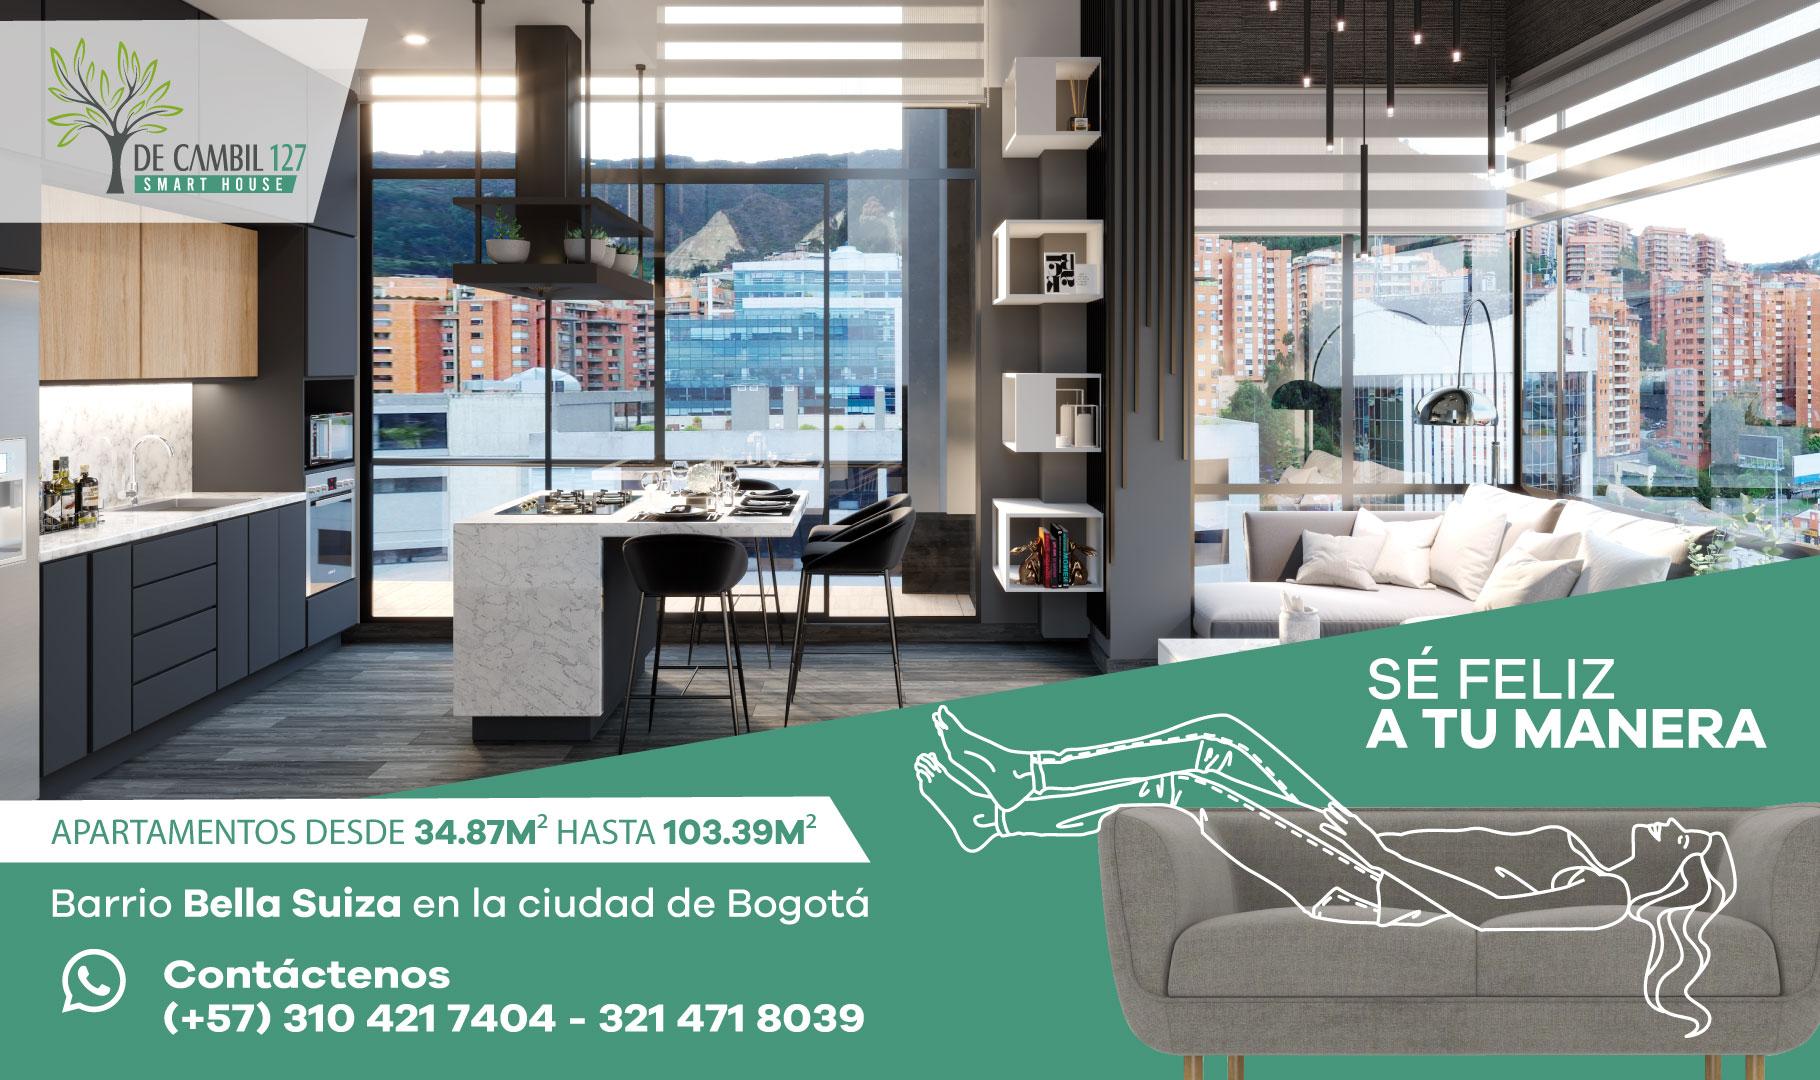 127 Smart House Bella Suiza Bogotá